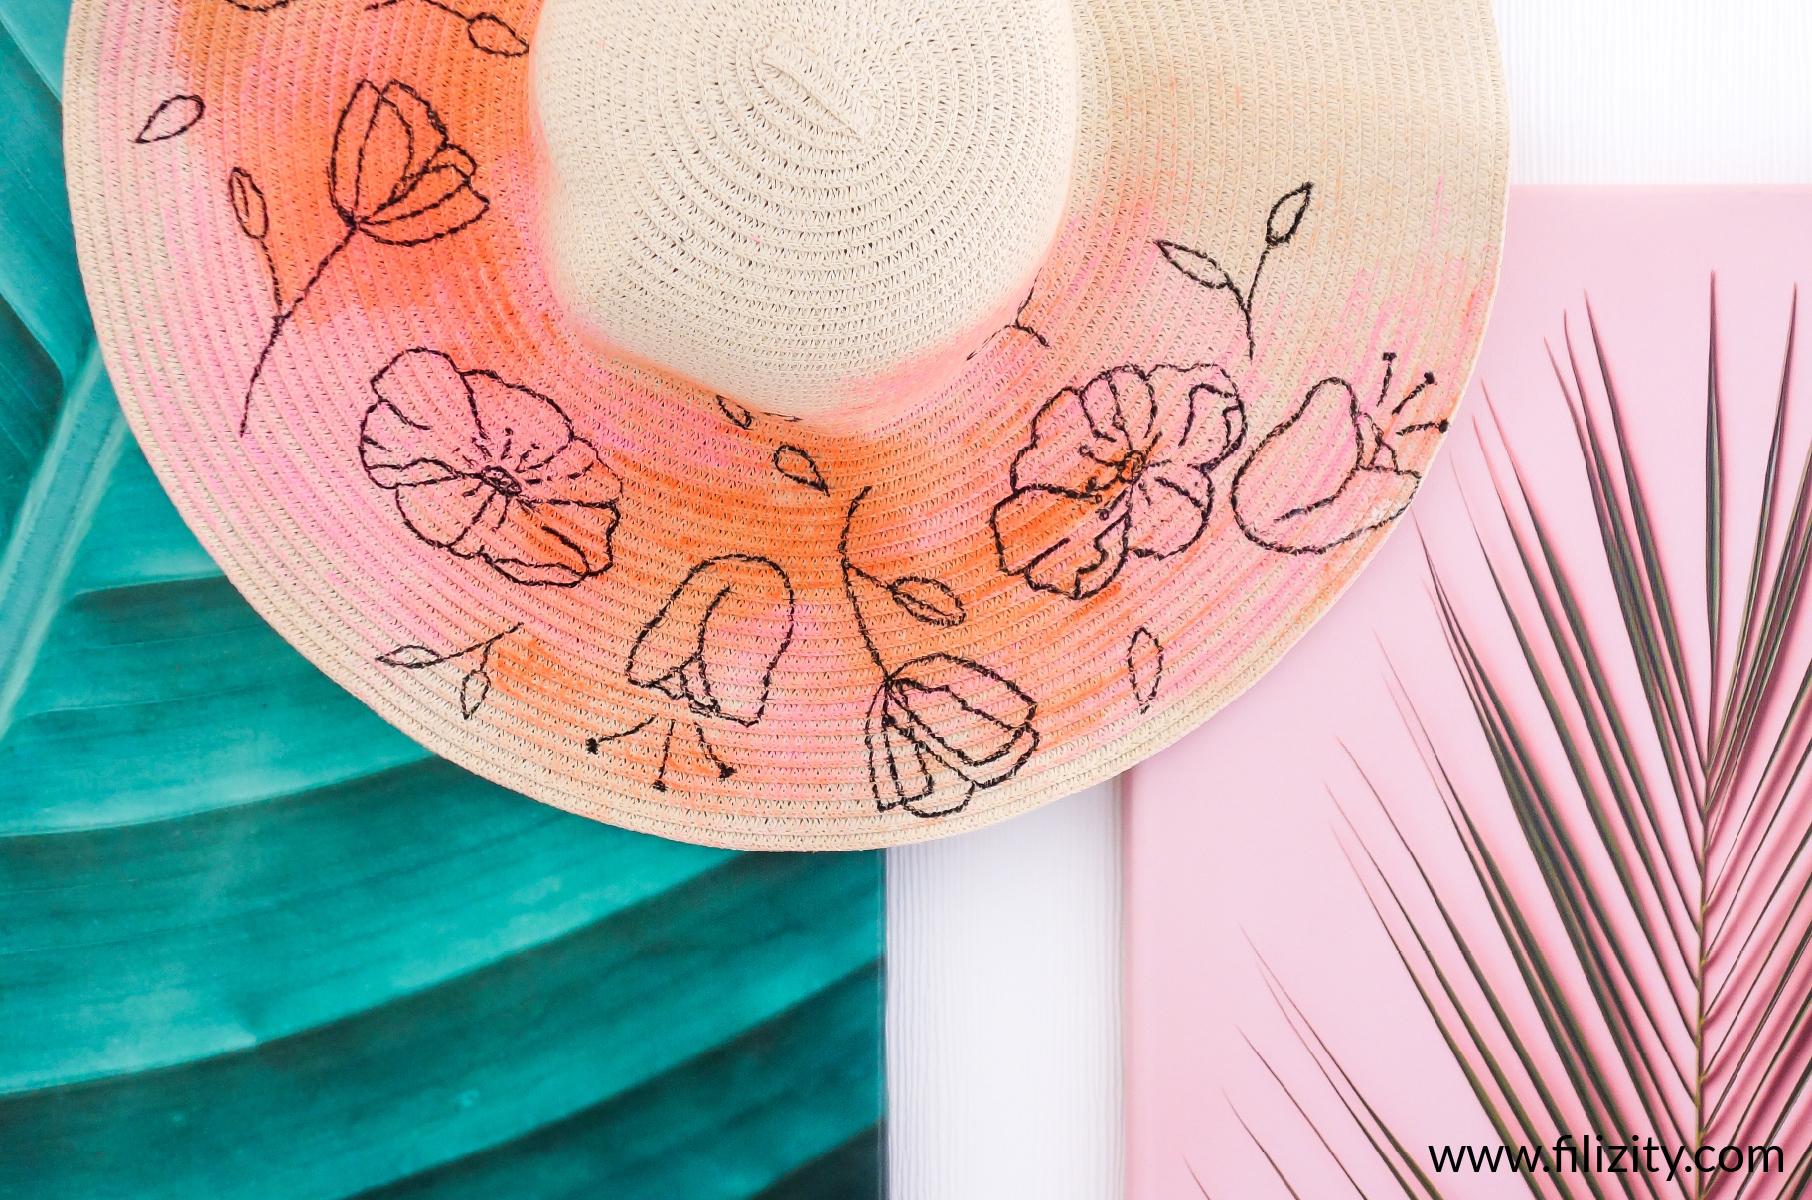 Sommer DIY: Sommerhut bemalen mit trendigen Line Art Blumen | Filizity. Kreativmagazin & DIY-Blog #sommerhut #aquarell #line-art